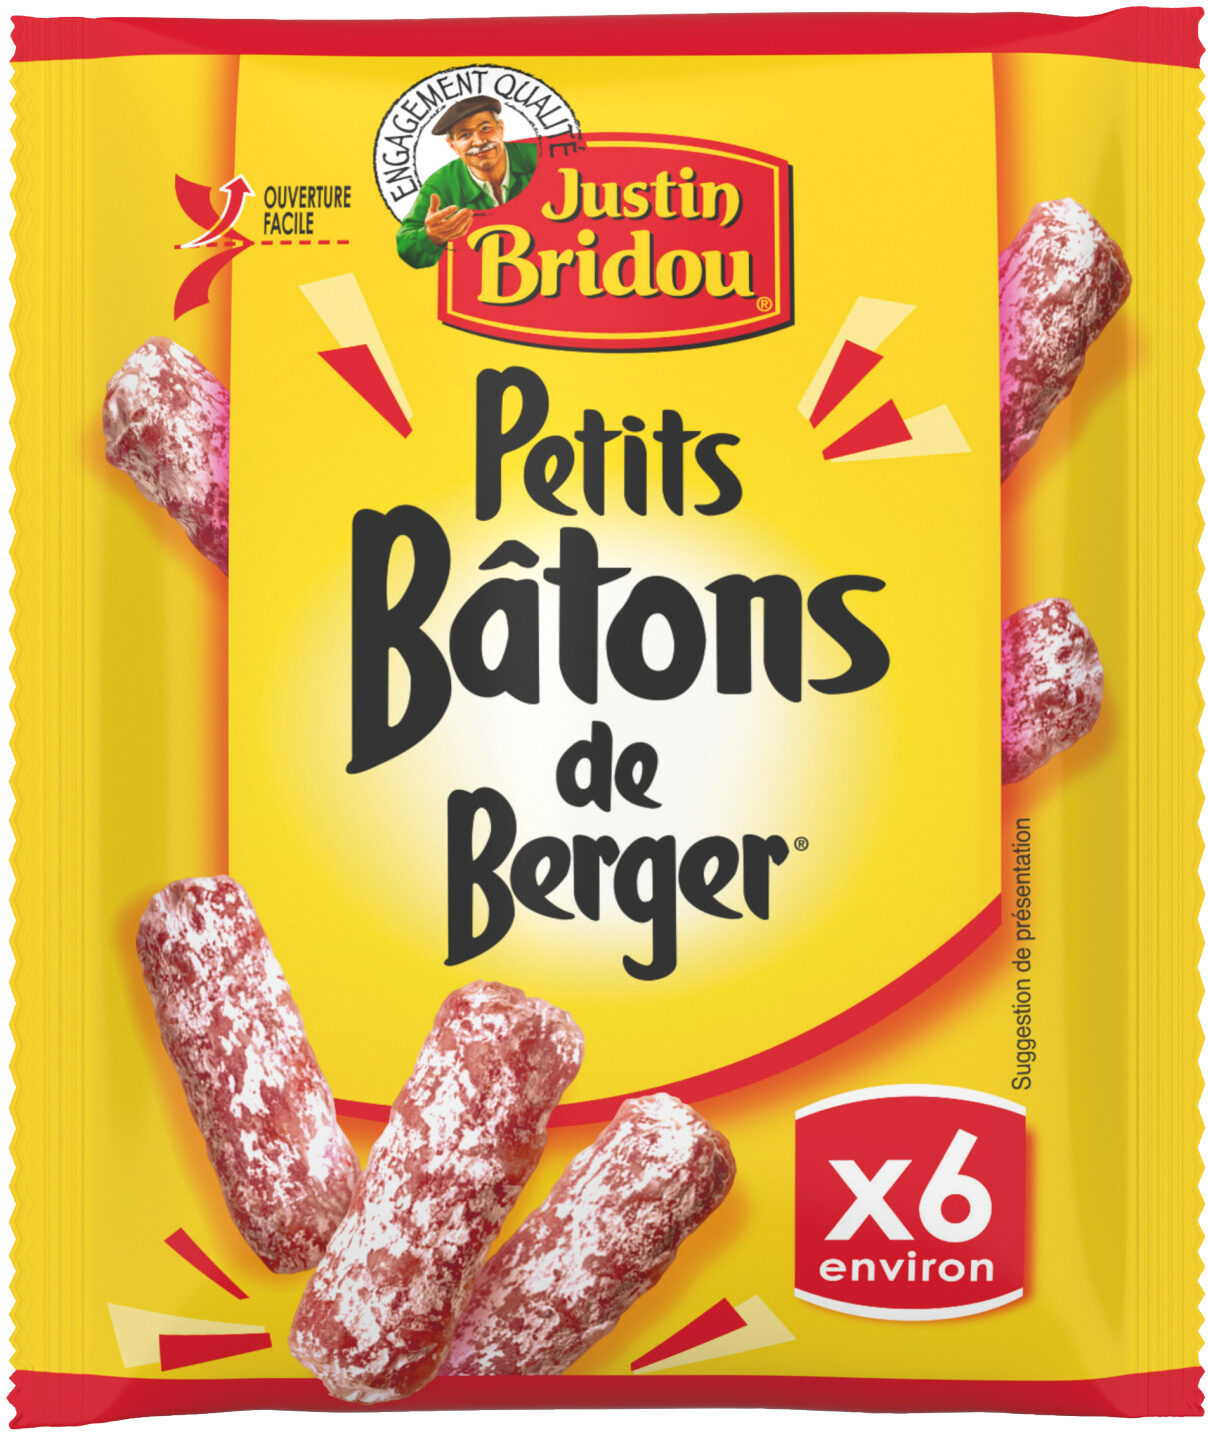 Petits Bâtons de Berger (x 7 environ) - Produit - fr